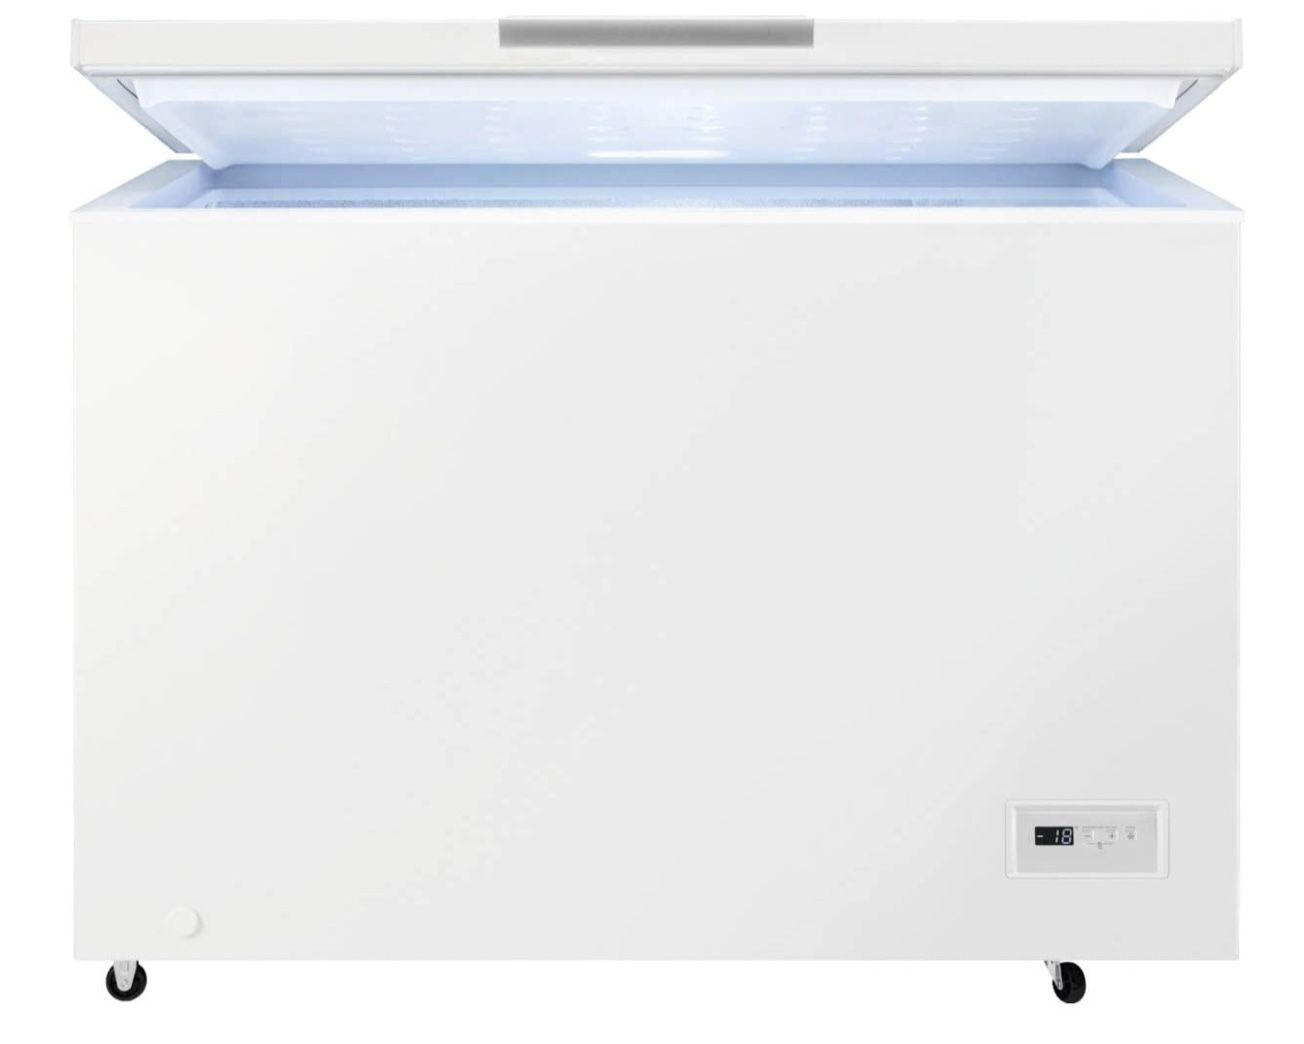 AEG AHB531E1LW Gefriertruhe mit LED Display ab 399€ (statt 499€)